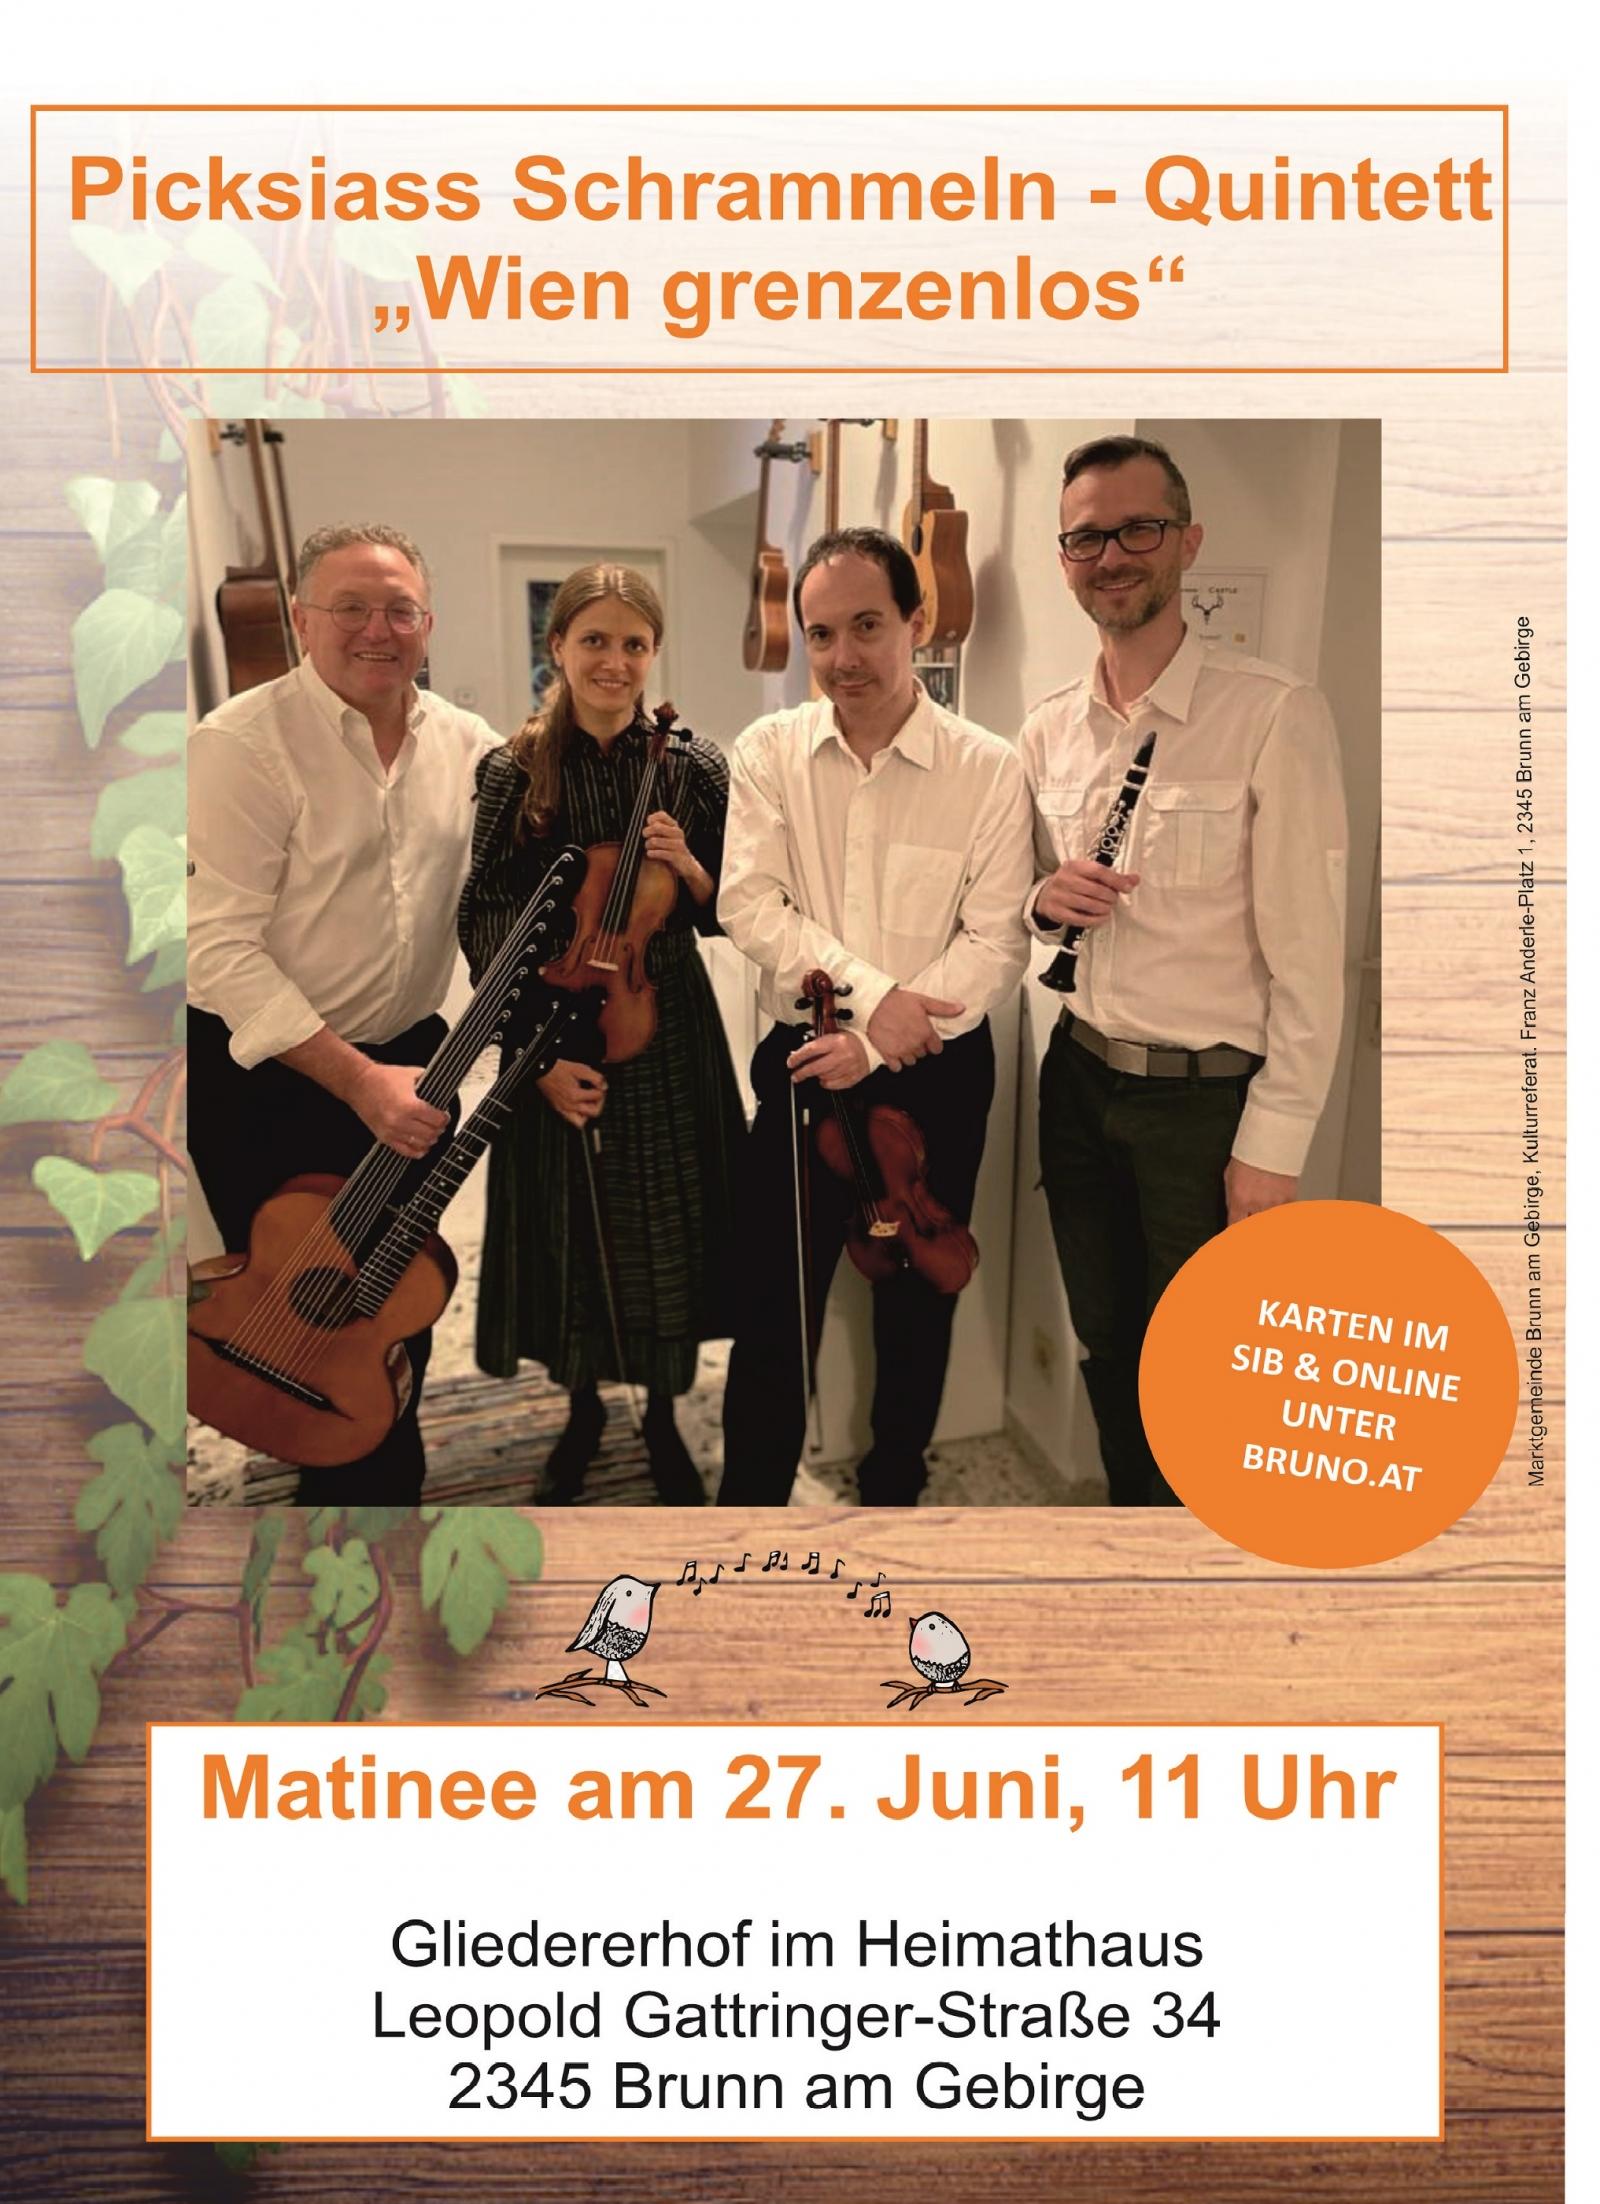 Picksiass Schrammeln - Quintett Wien grenzenlos